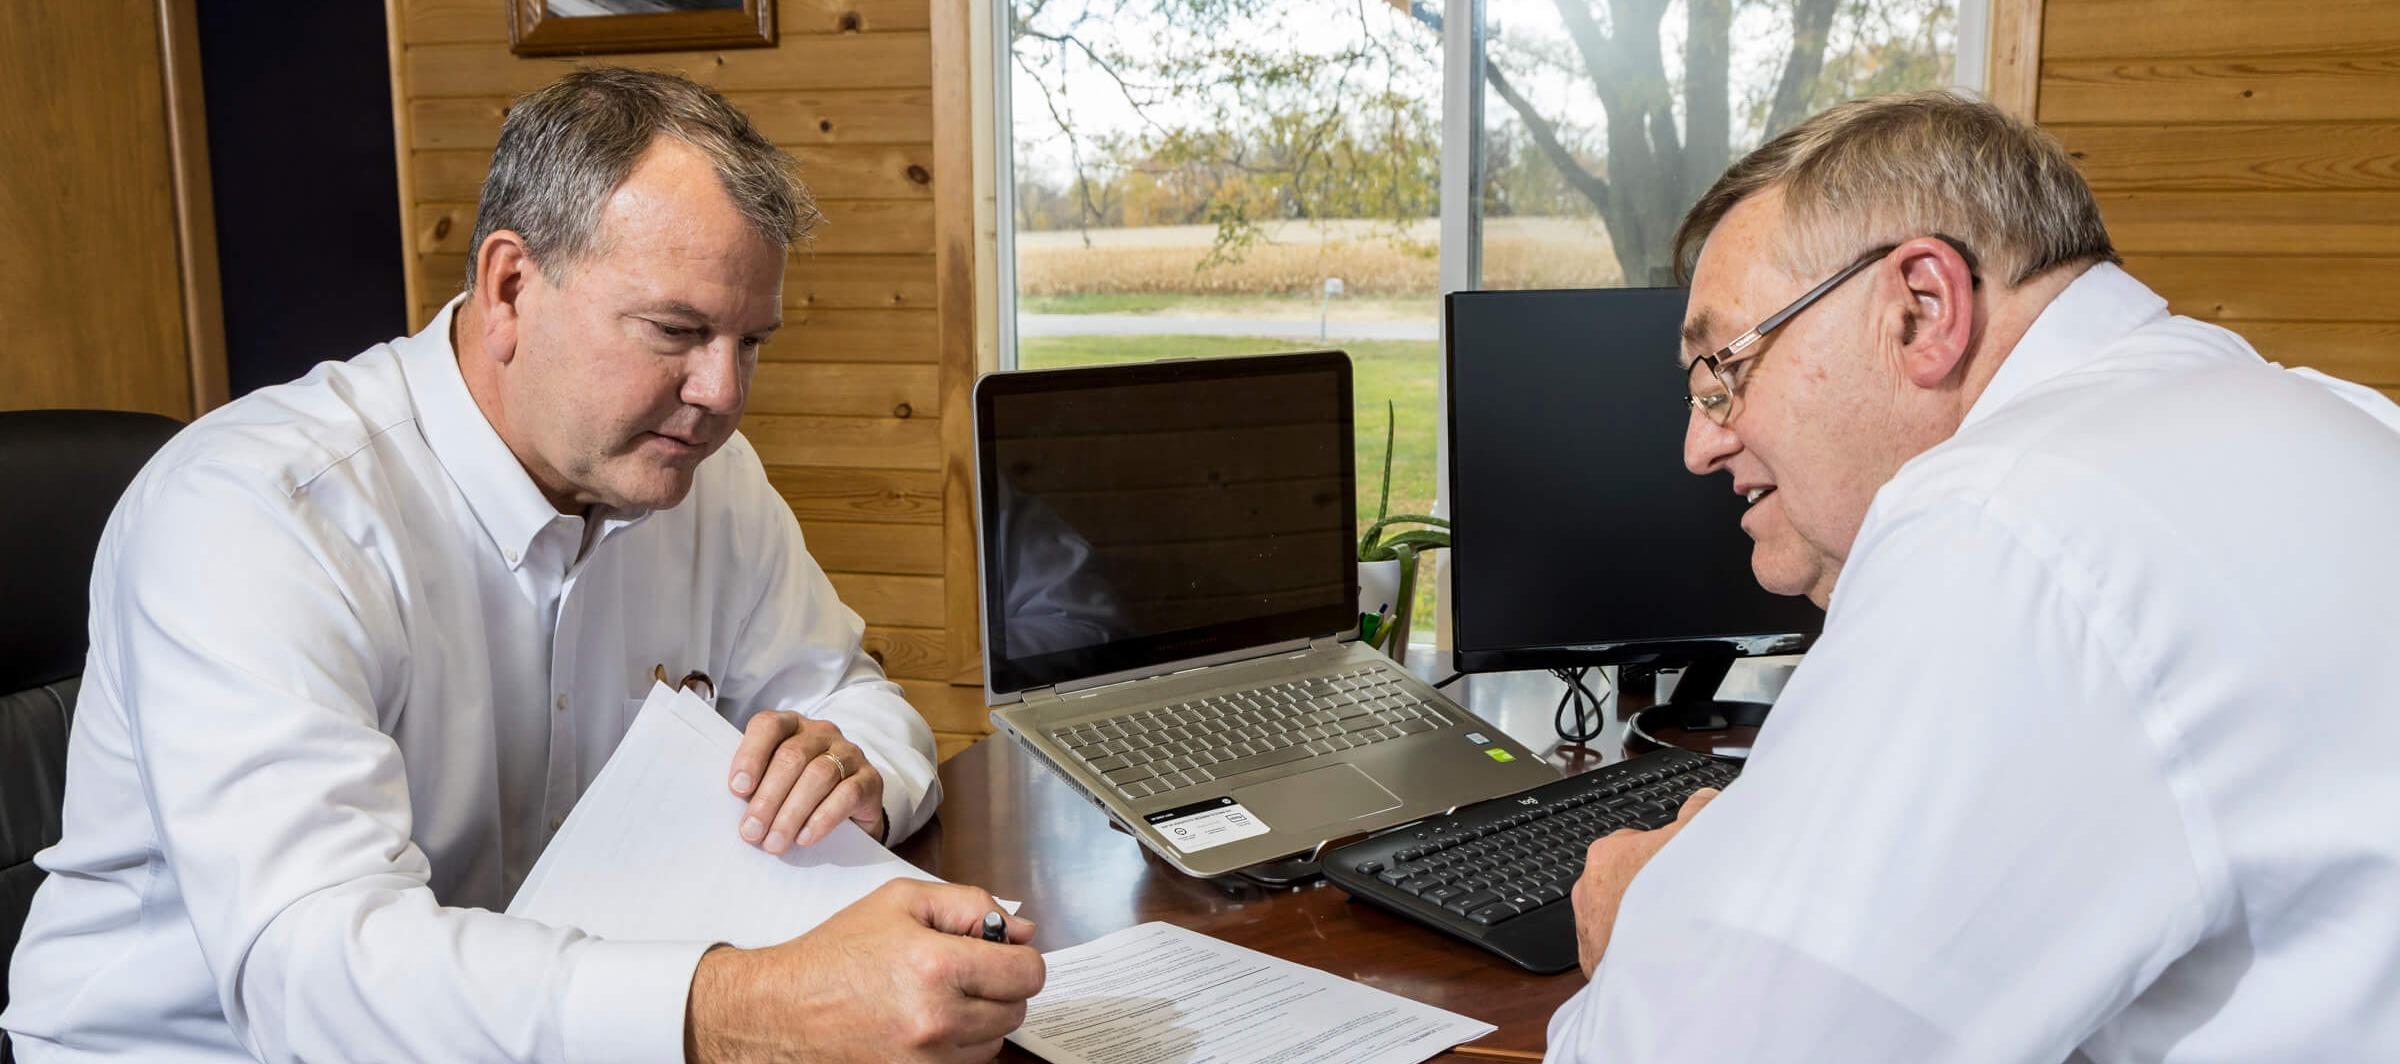 Transworld Business Advisors | Minnesota